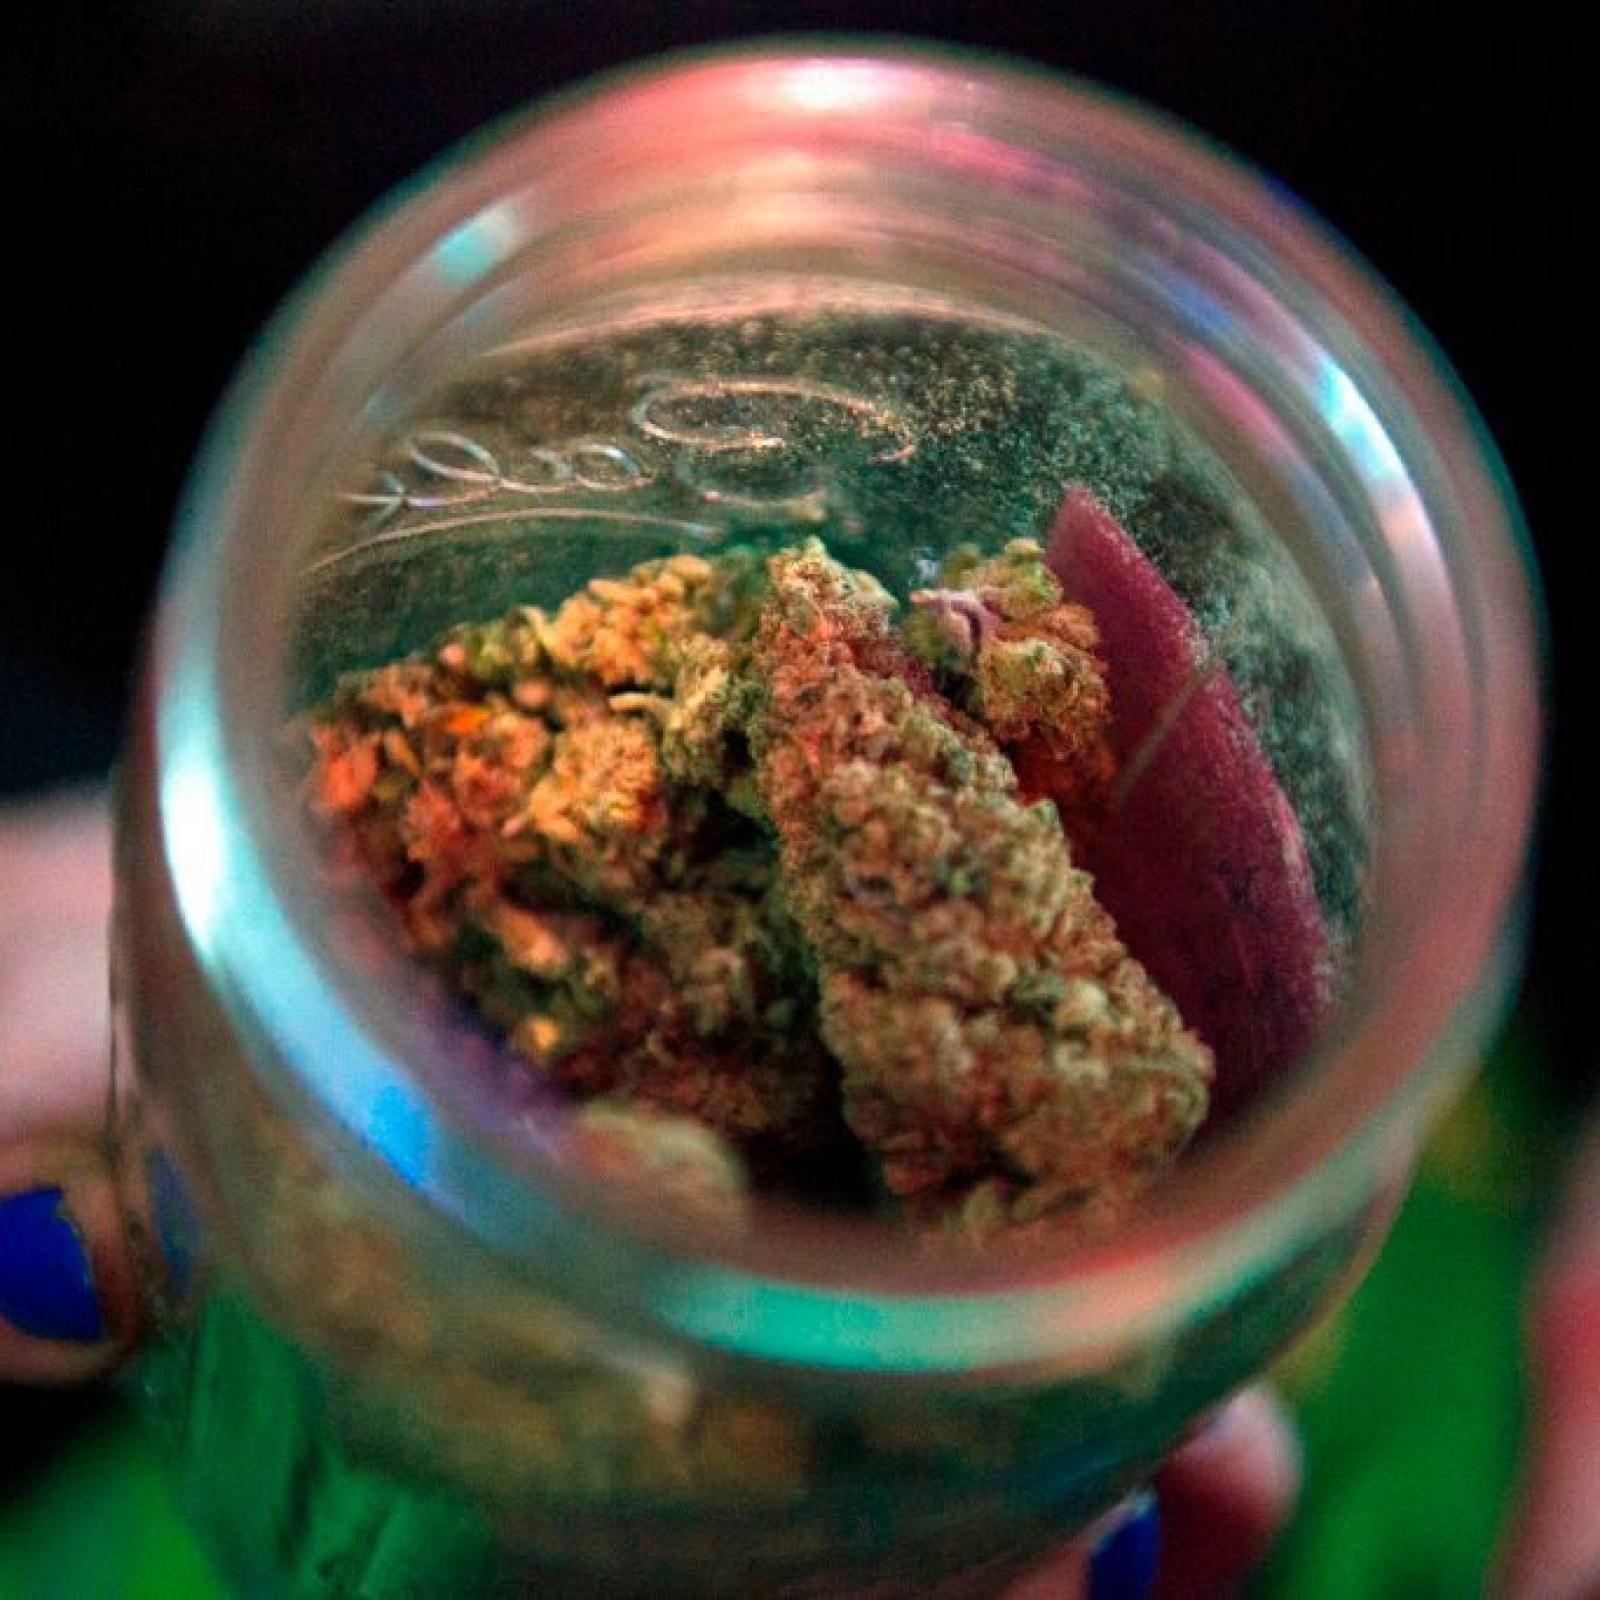 Vermont Recreational Marijuana Legalization: What Is Legal